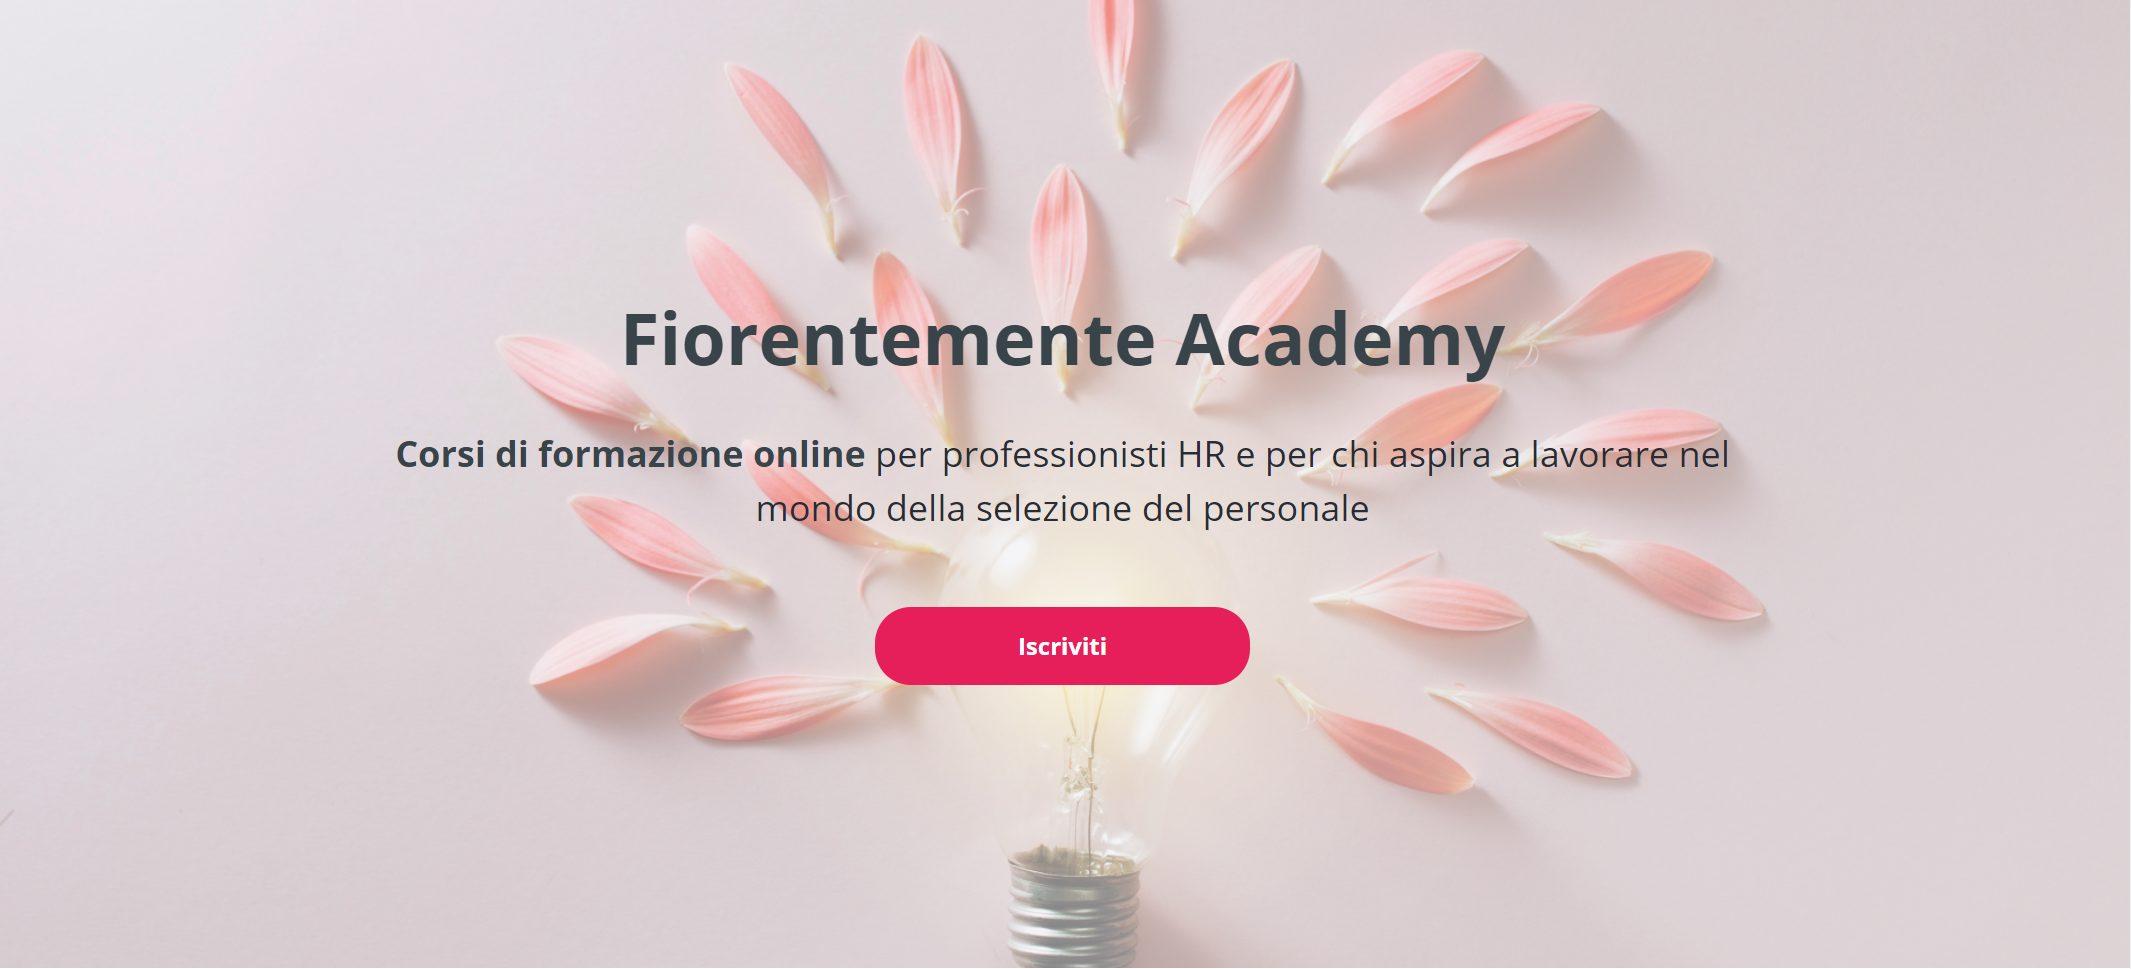 Fiorentemente Academy